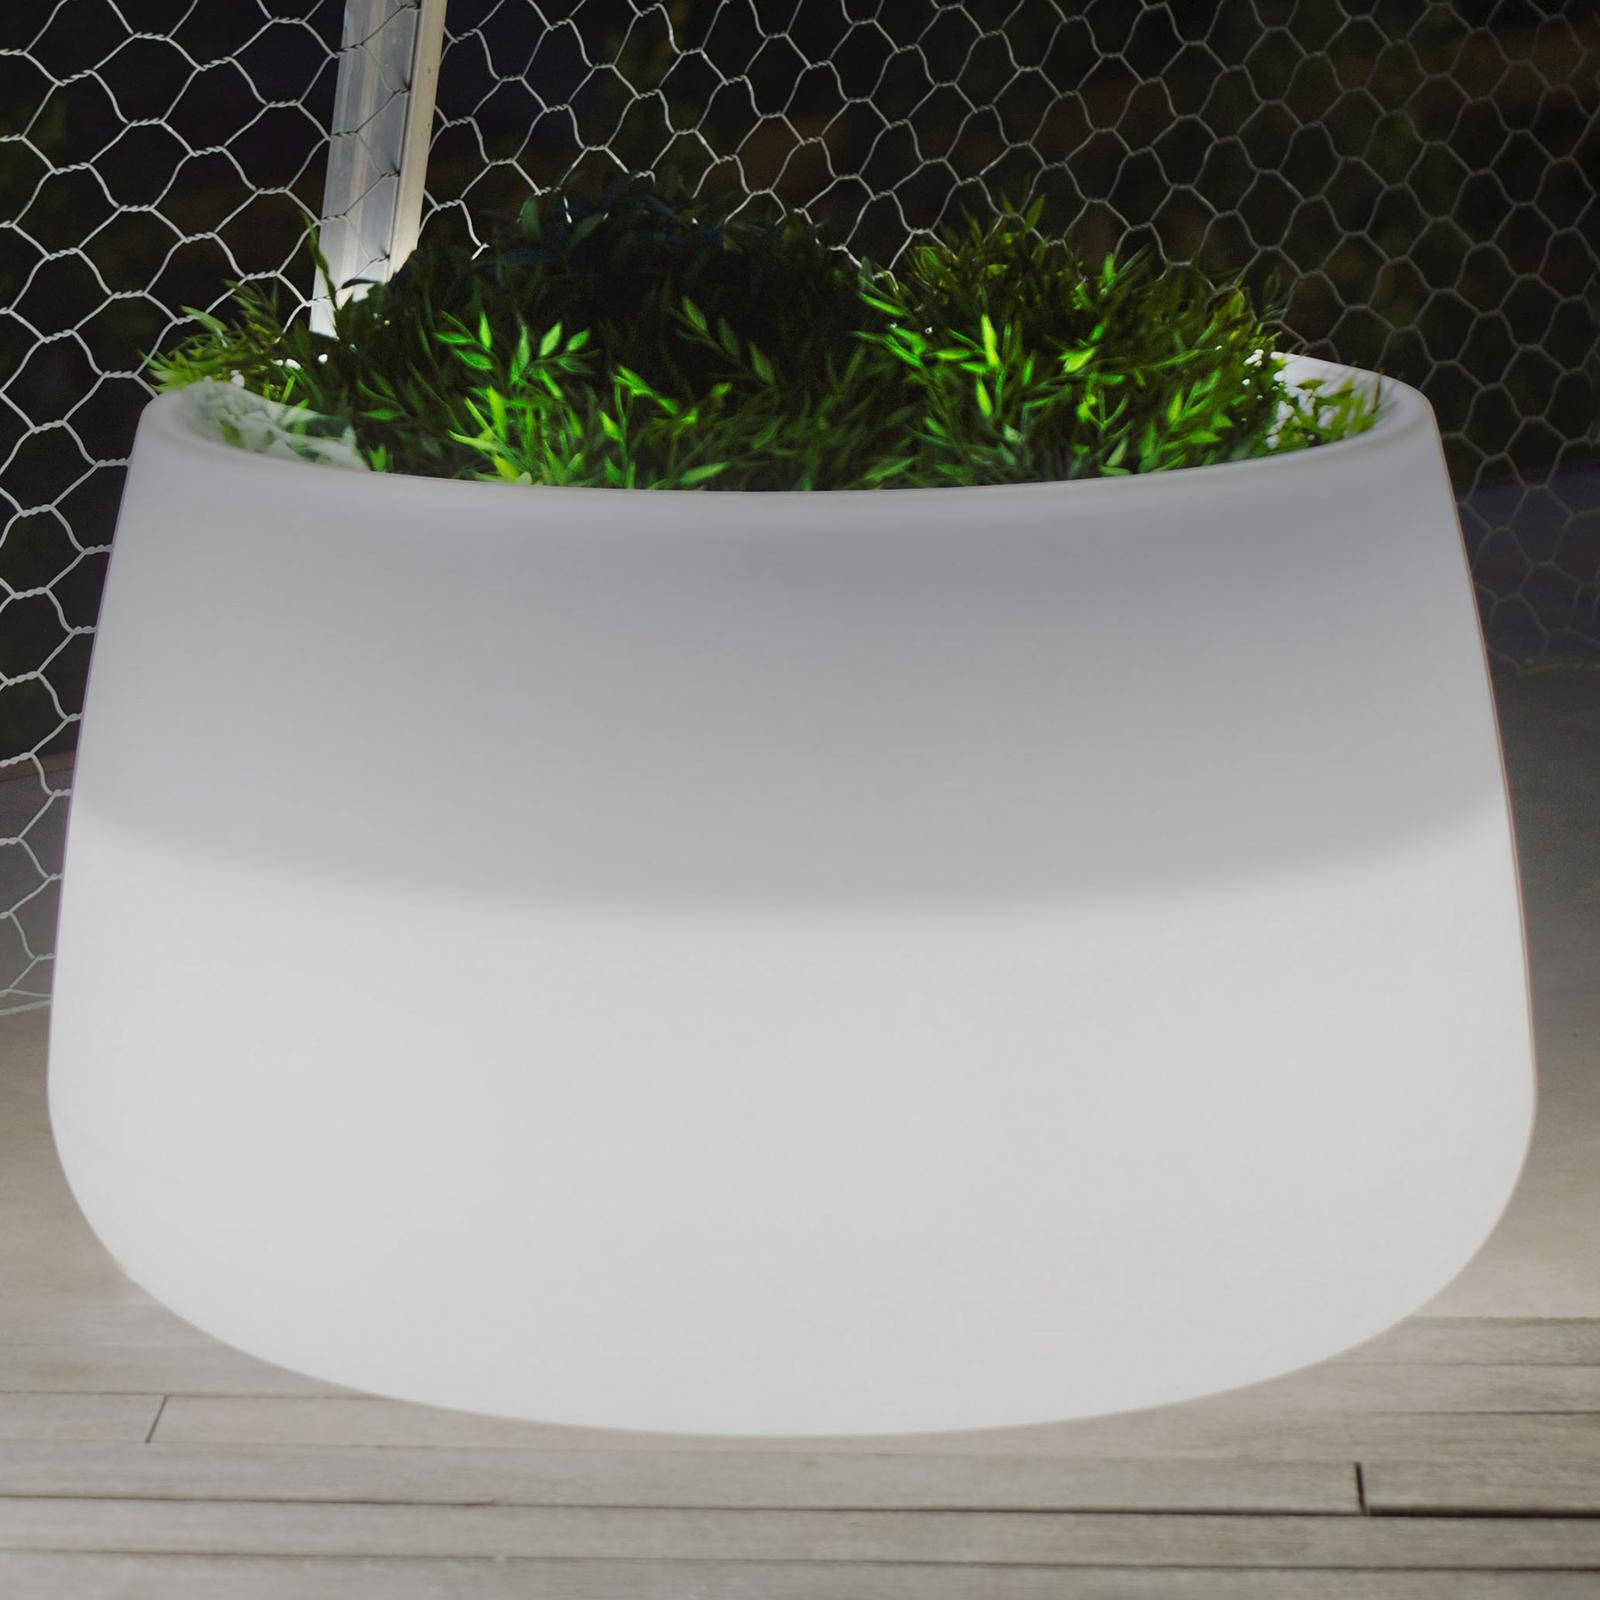 Newgarden Camelia 60 vaso piante LED solar+accu